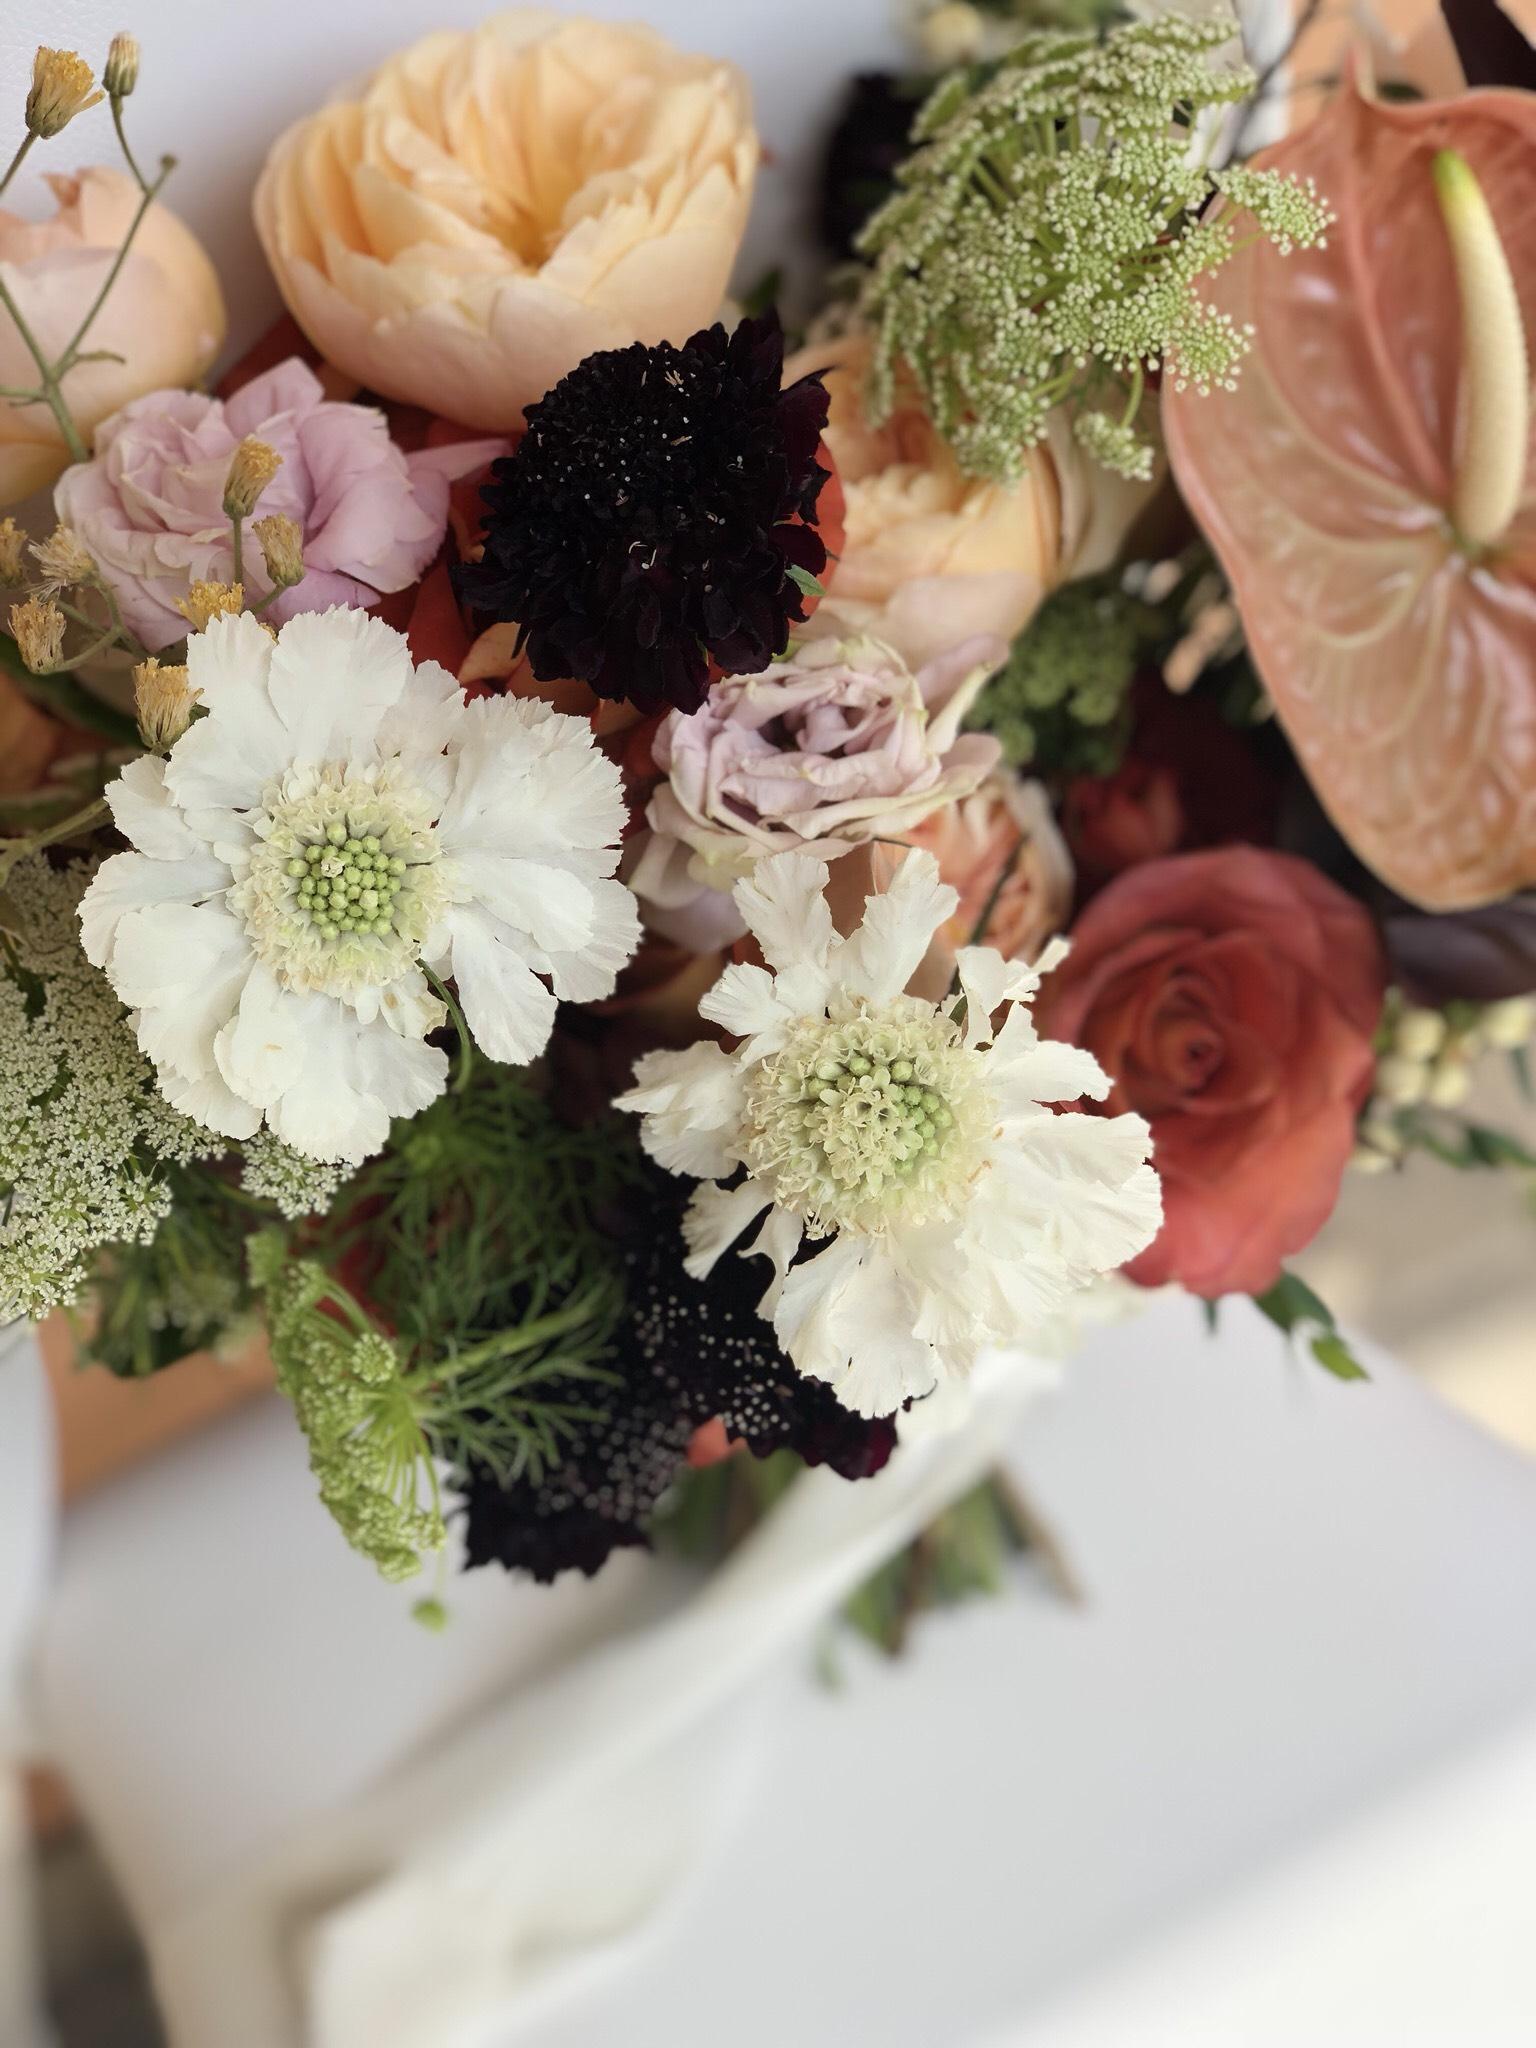 Floral Design Karla Casillas and Co.